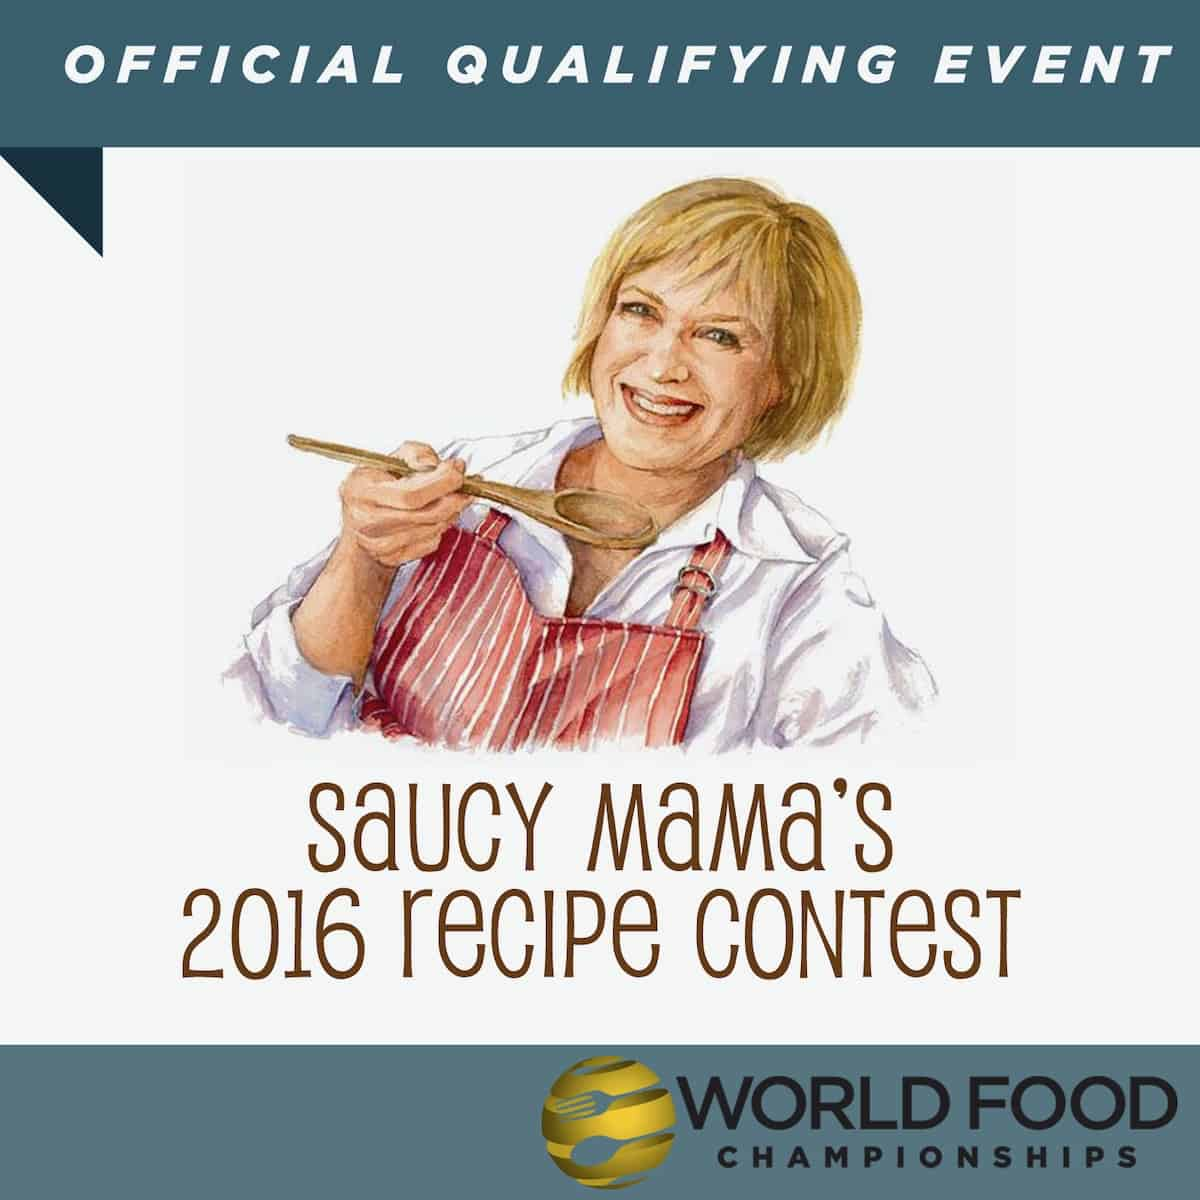 Saucy Mama 2016-recipe-logo